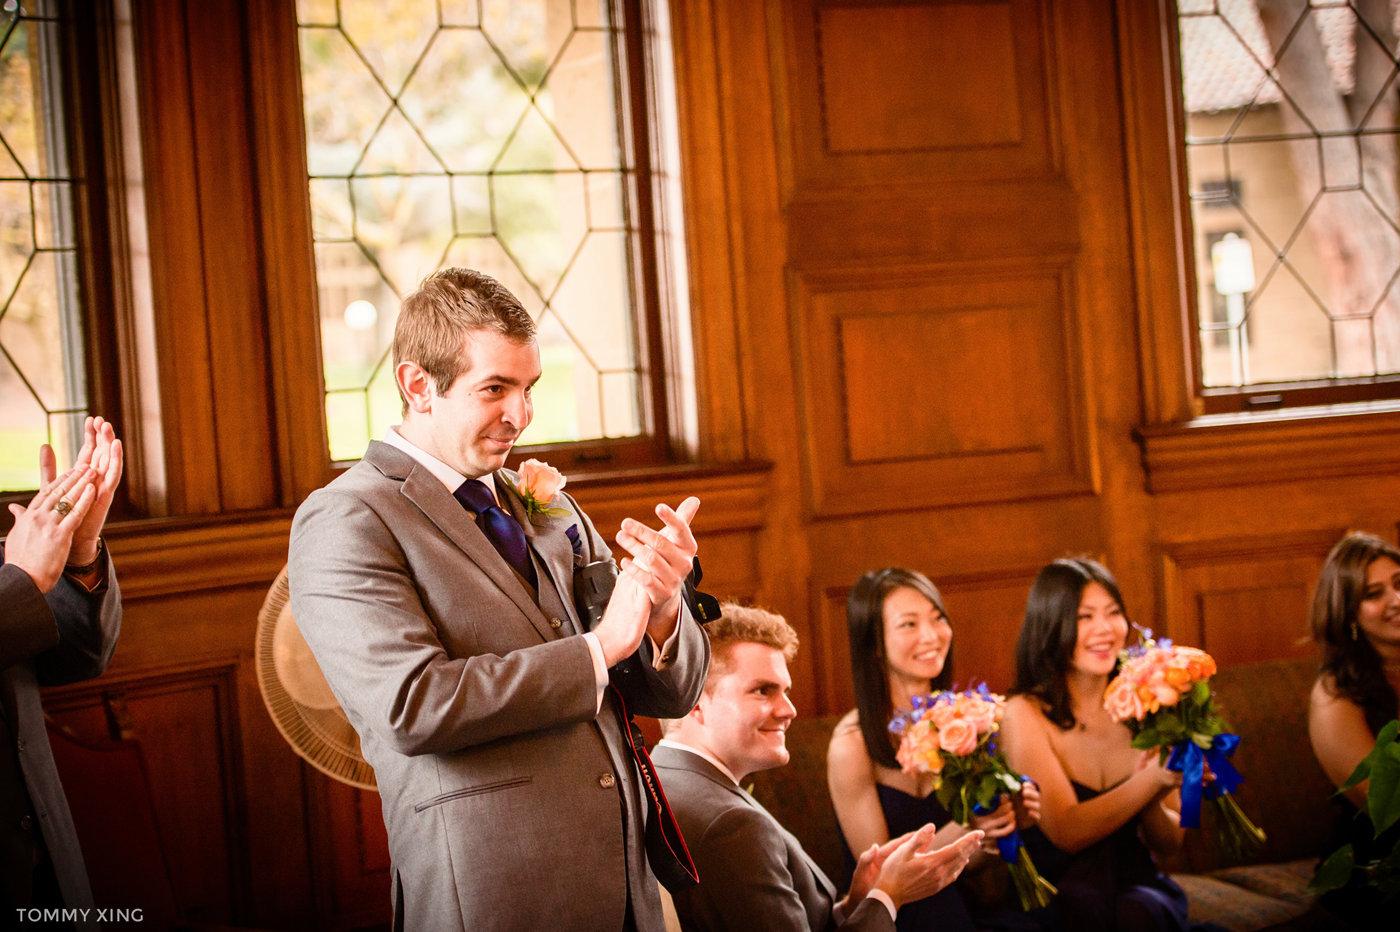 STANFORD MEMORIAL CHURCH WEDDING - Wenjie & Chengcheng - SAN FRANCISCO BAY AREA 斯坦福教堂婚礼跟拍 - 洛杉矶婚礼婚纱照摄影师 Tommy Xing Photography133.jpg